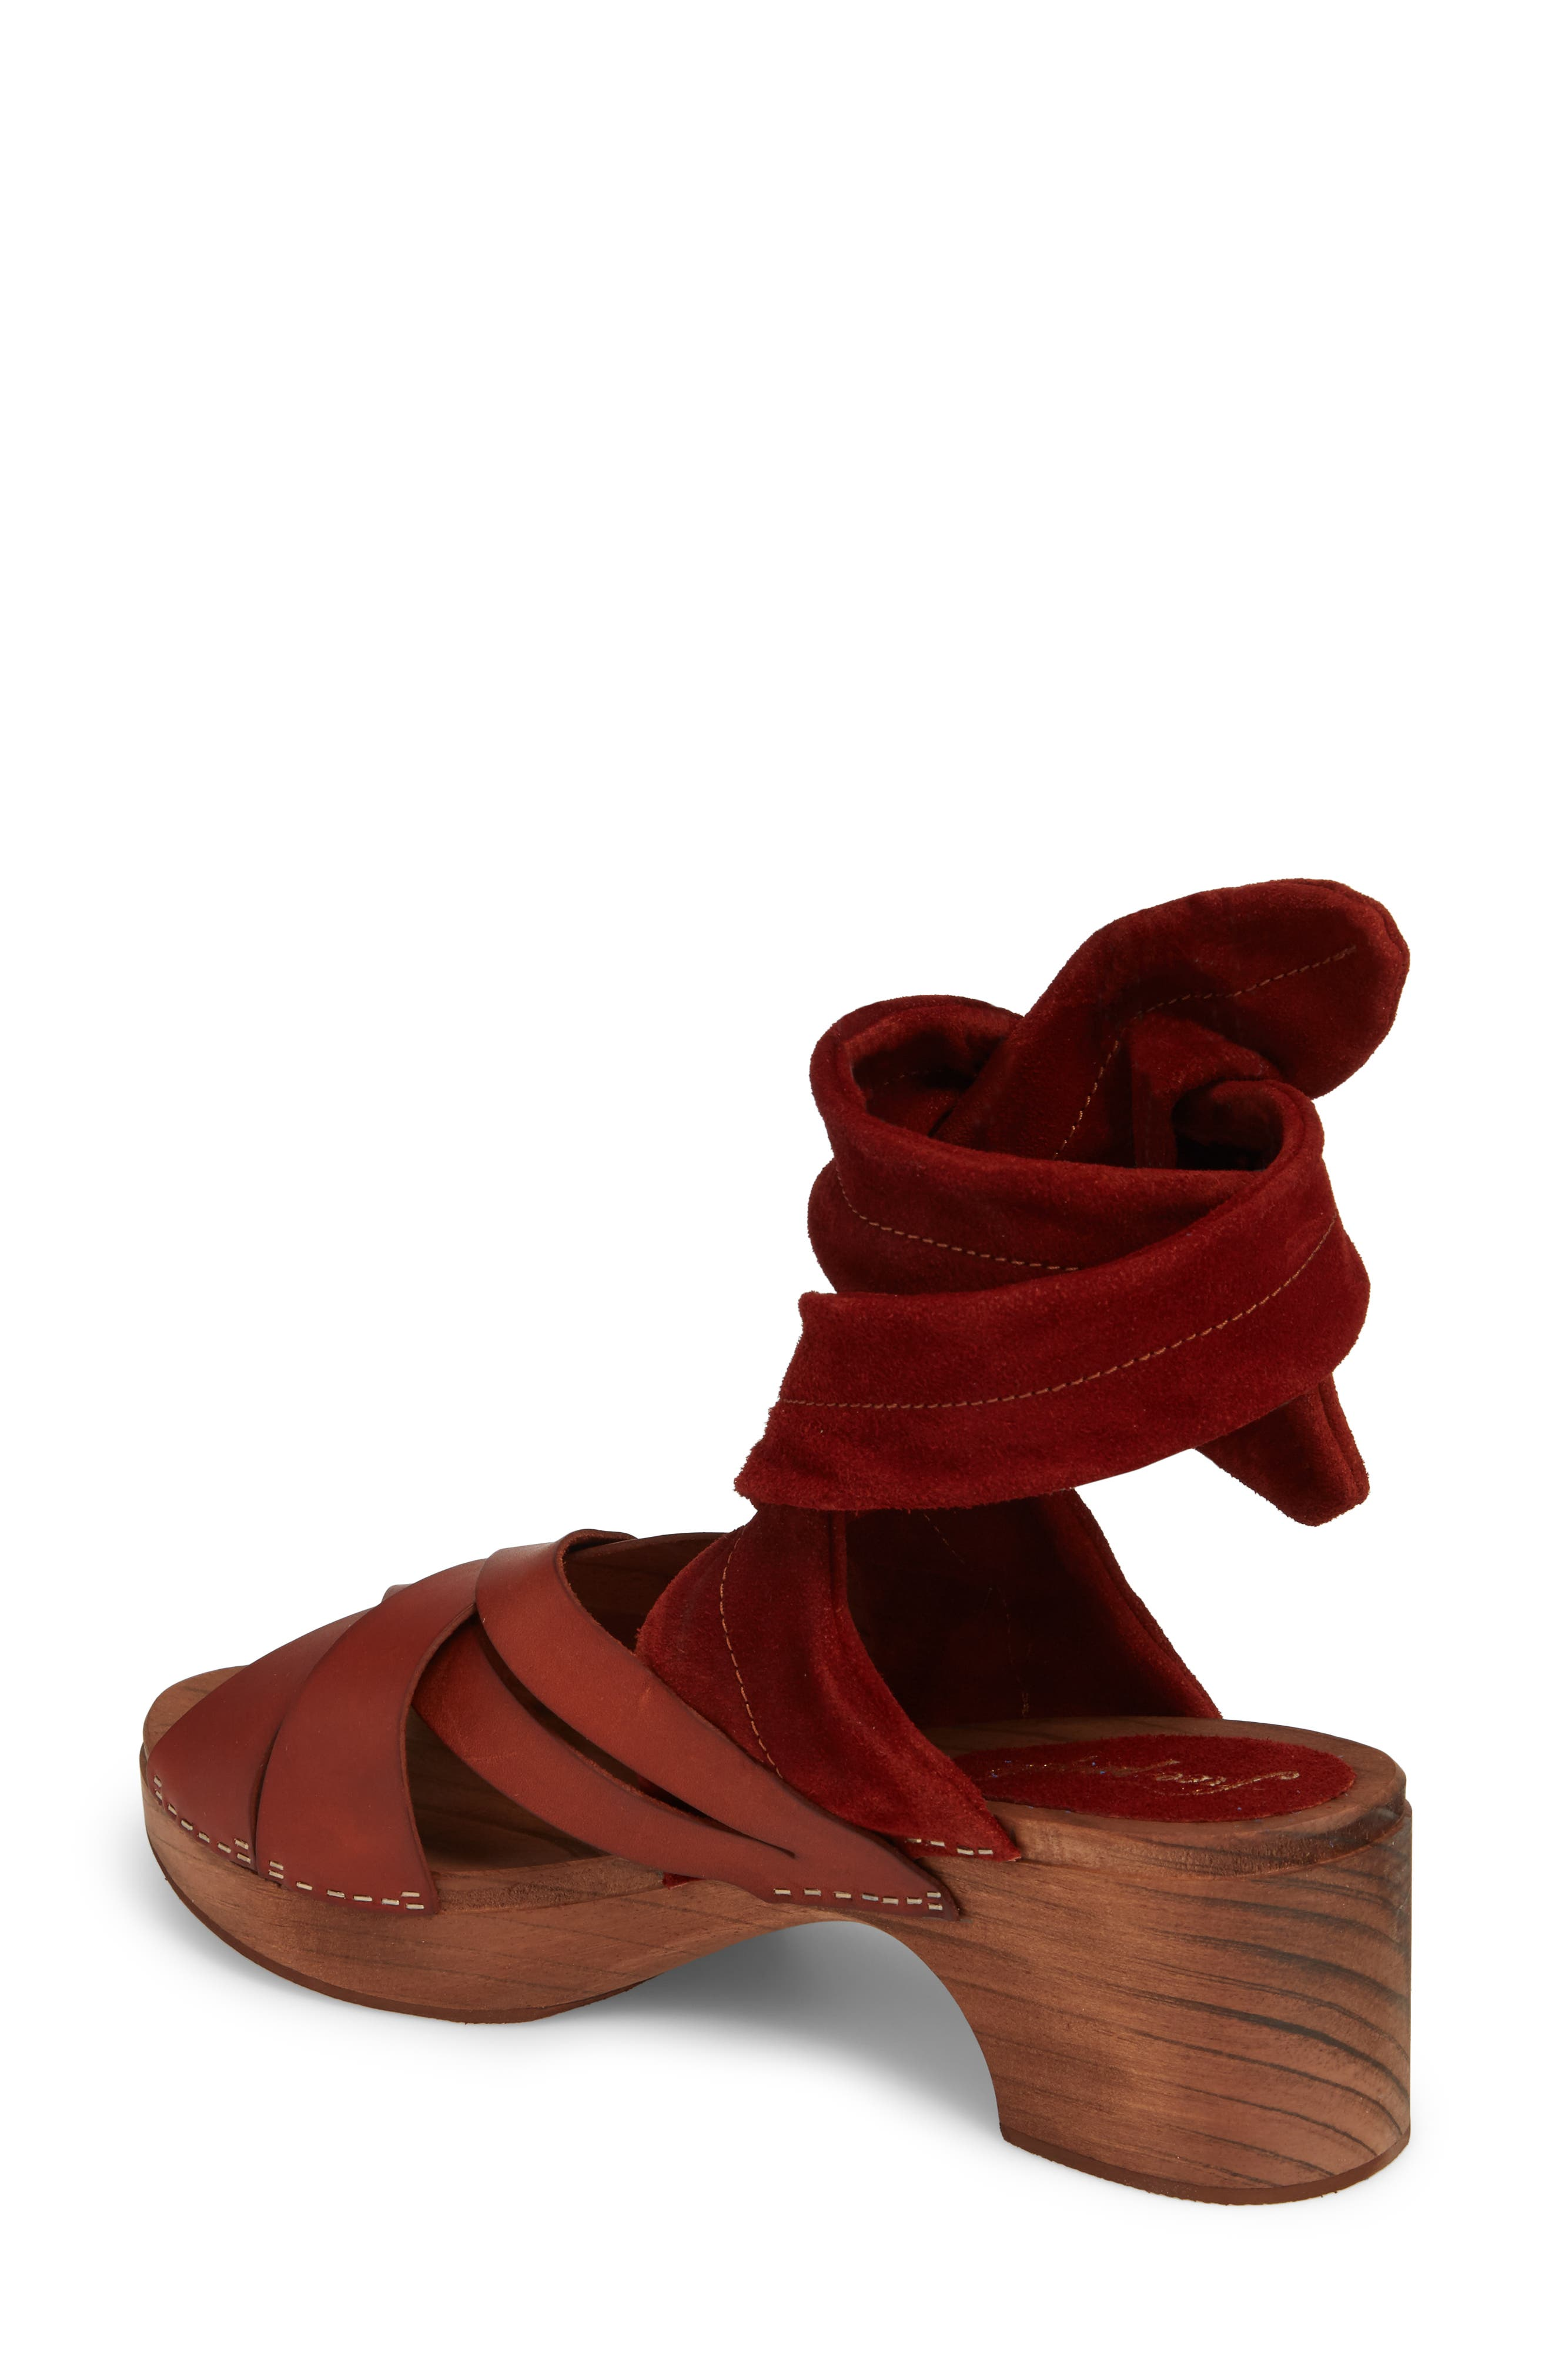 Emmy Ankle Wrap Sandal,                             Alternate thumbnail 2, color,                             Brown